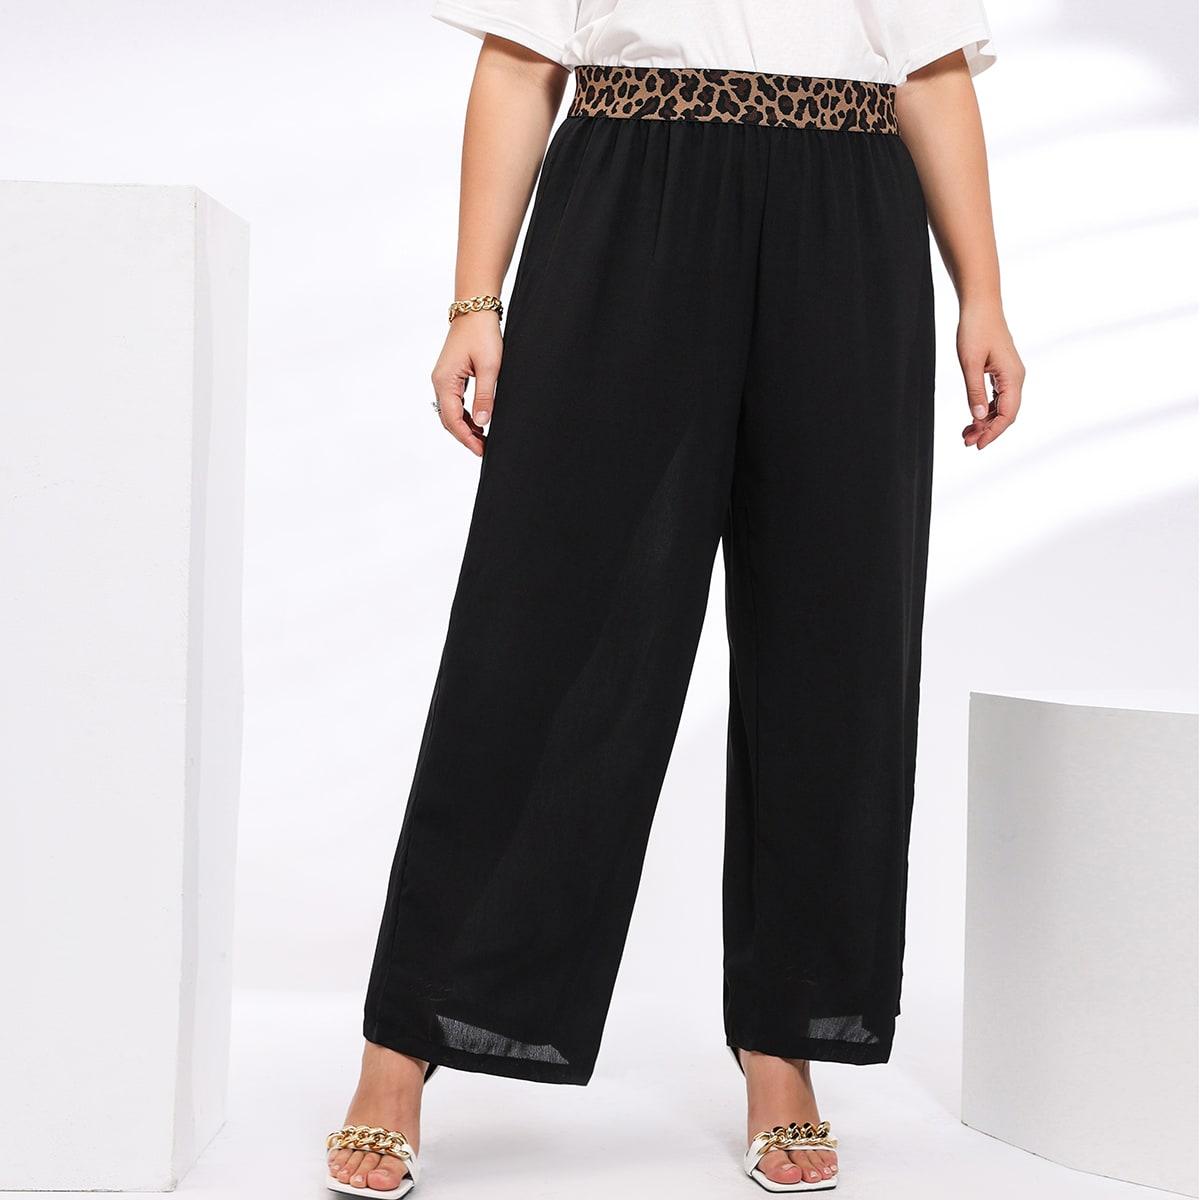 Plus Leopard Waist Wide Leg Pants, SHEIN  - buy with discount